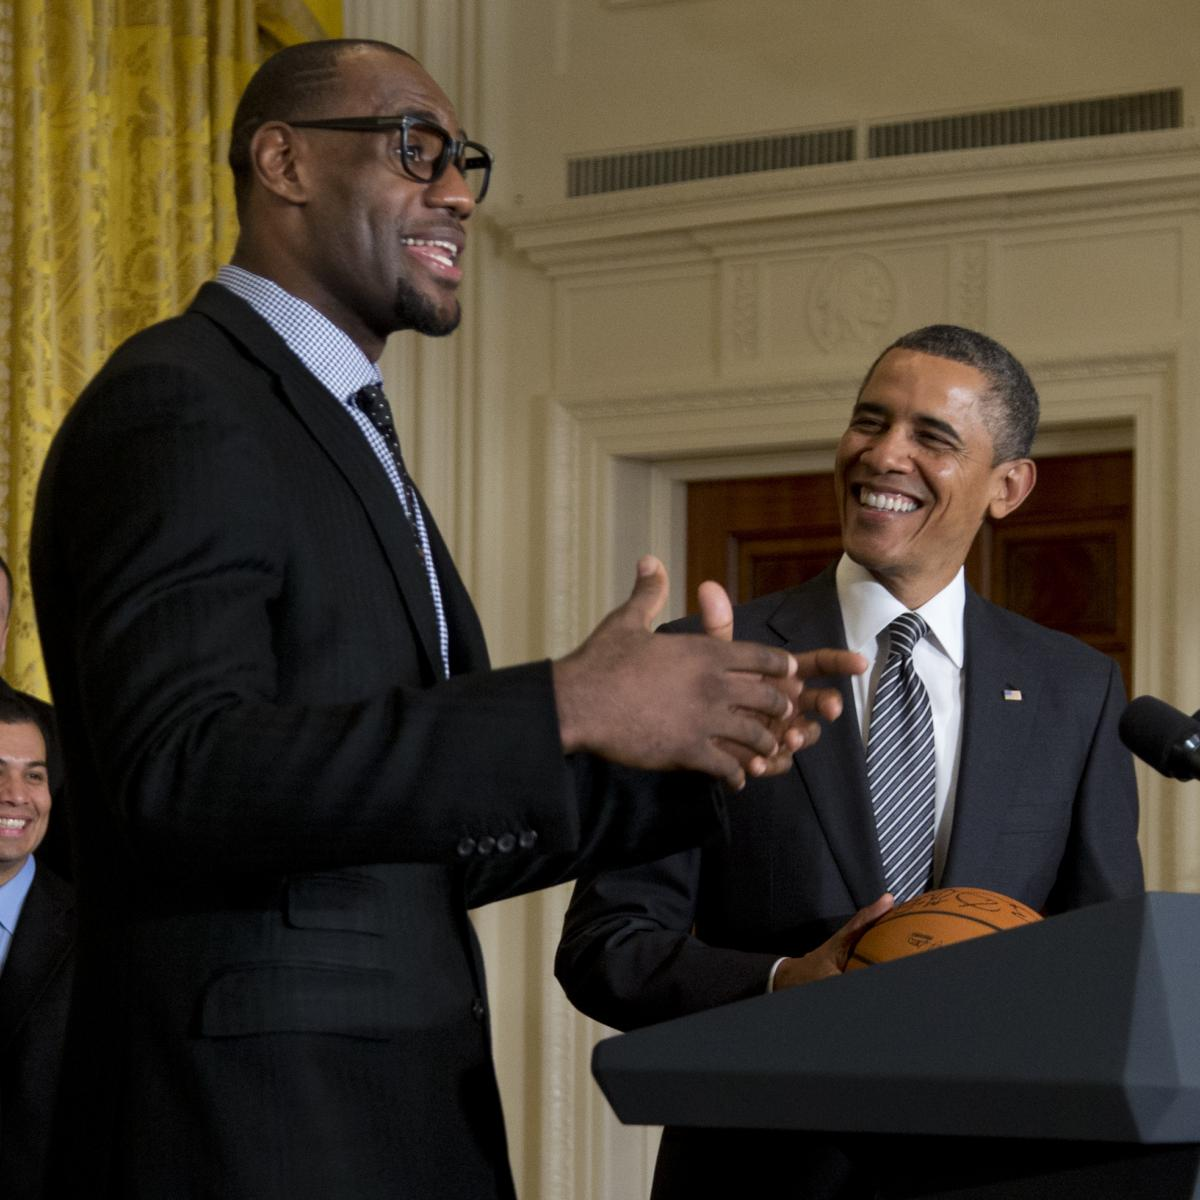 Lakers' LeBron James Wishes 'My Friend' Barack Obama Happy Birthday on Twitter thumbnail